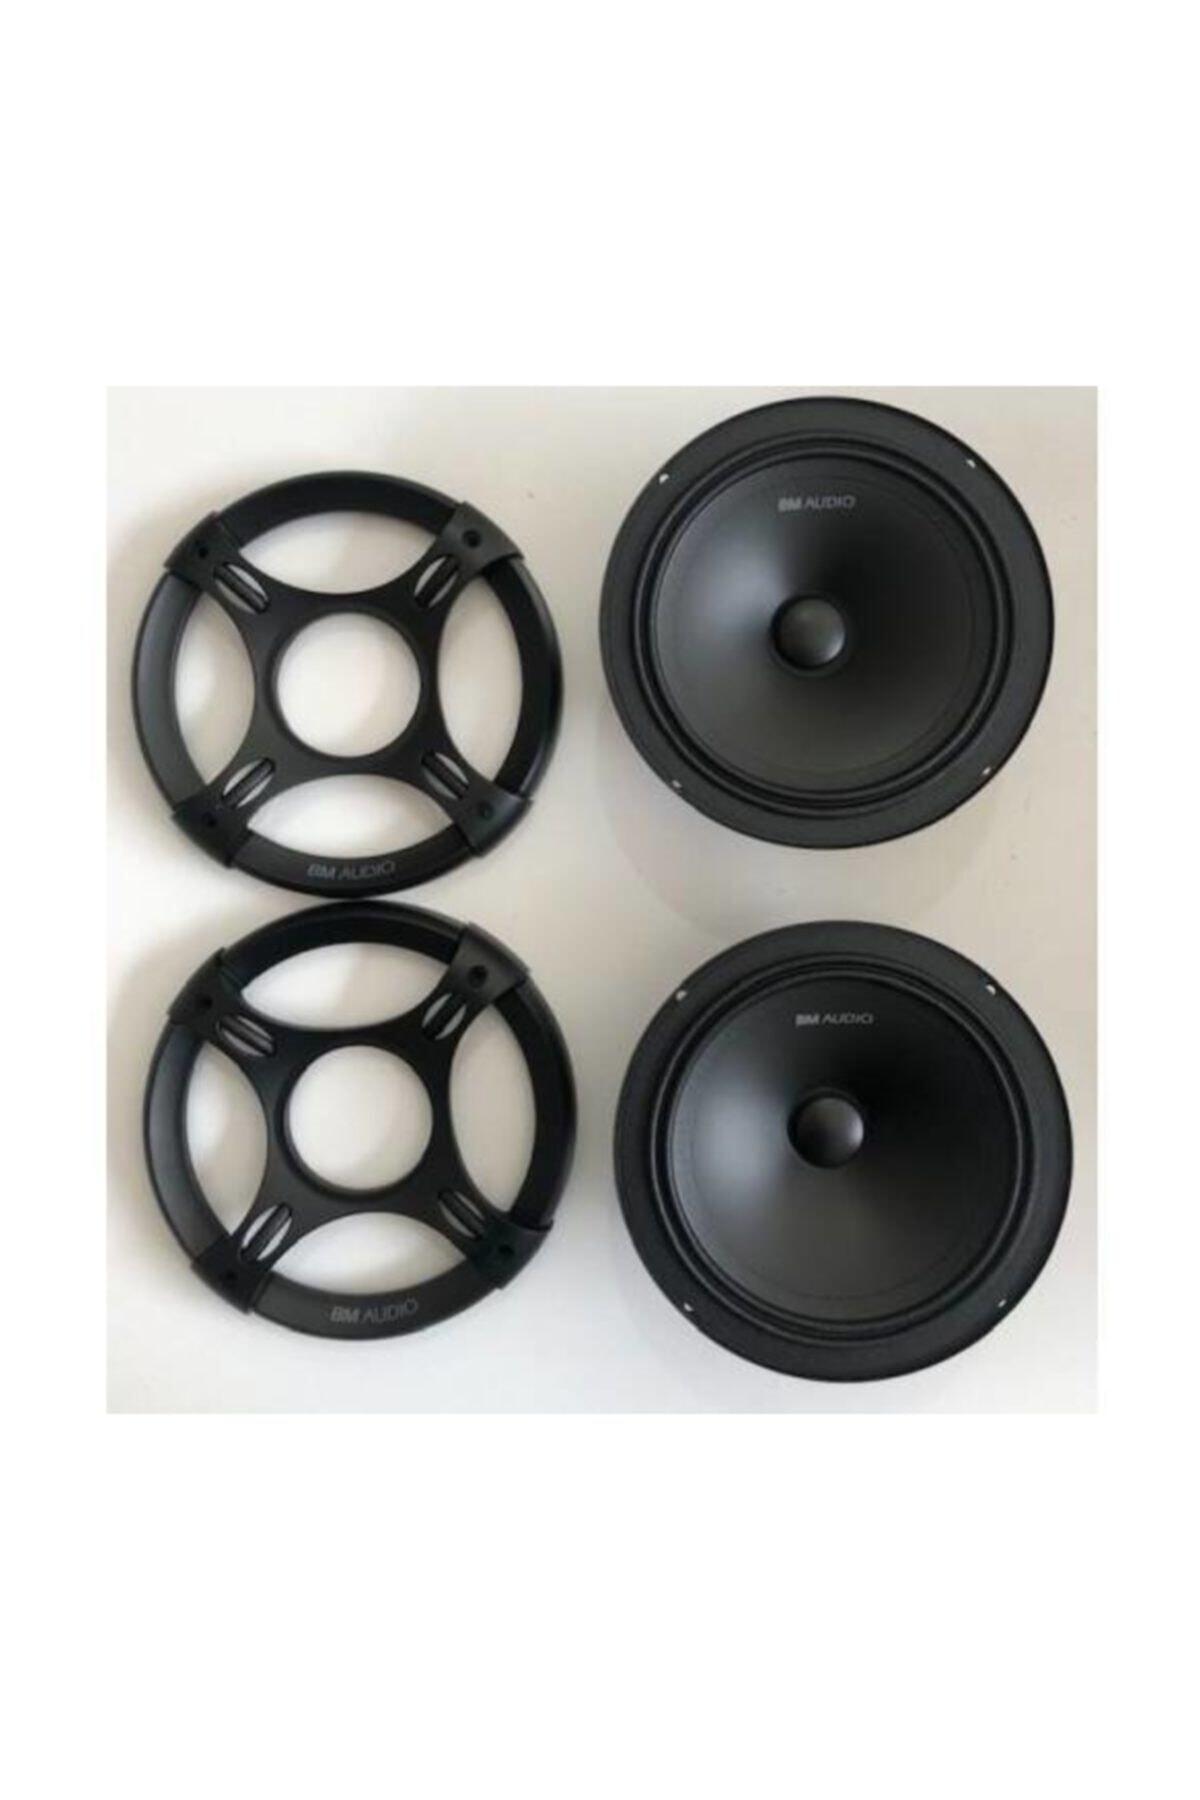 bm audio Boschmann 16 Cm 330 Watt Midrange Hoparlör Anfi Uyumlu ( 2 Adet ) 1